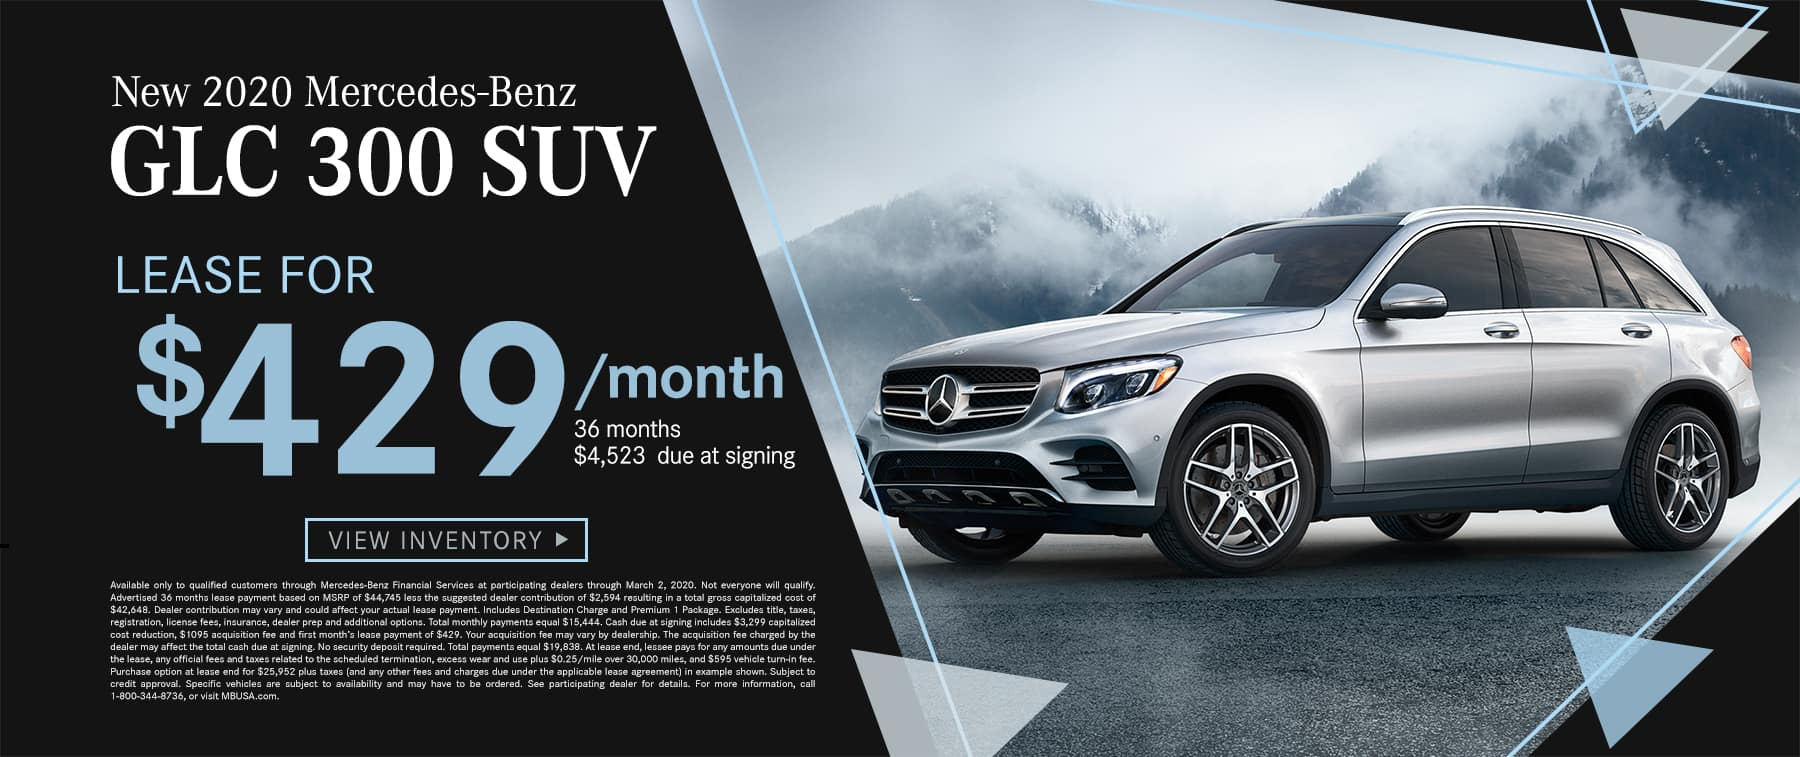 2020 GLC 300 SUV $429 Per Month